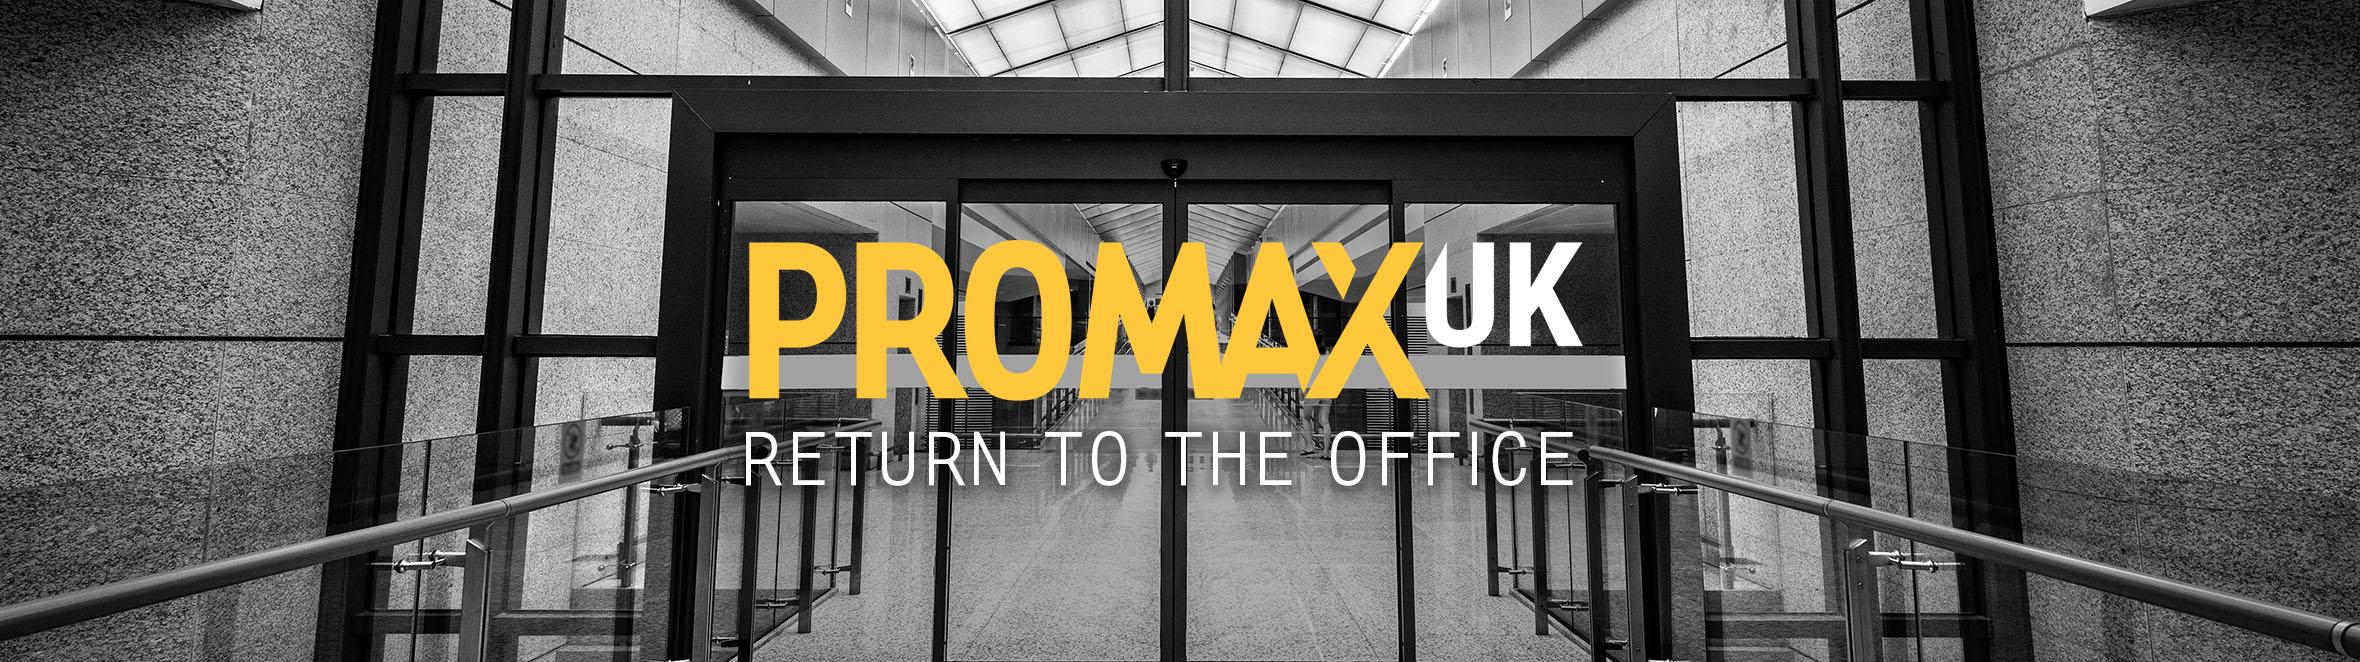 return_to_office_Header